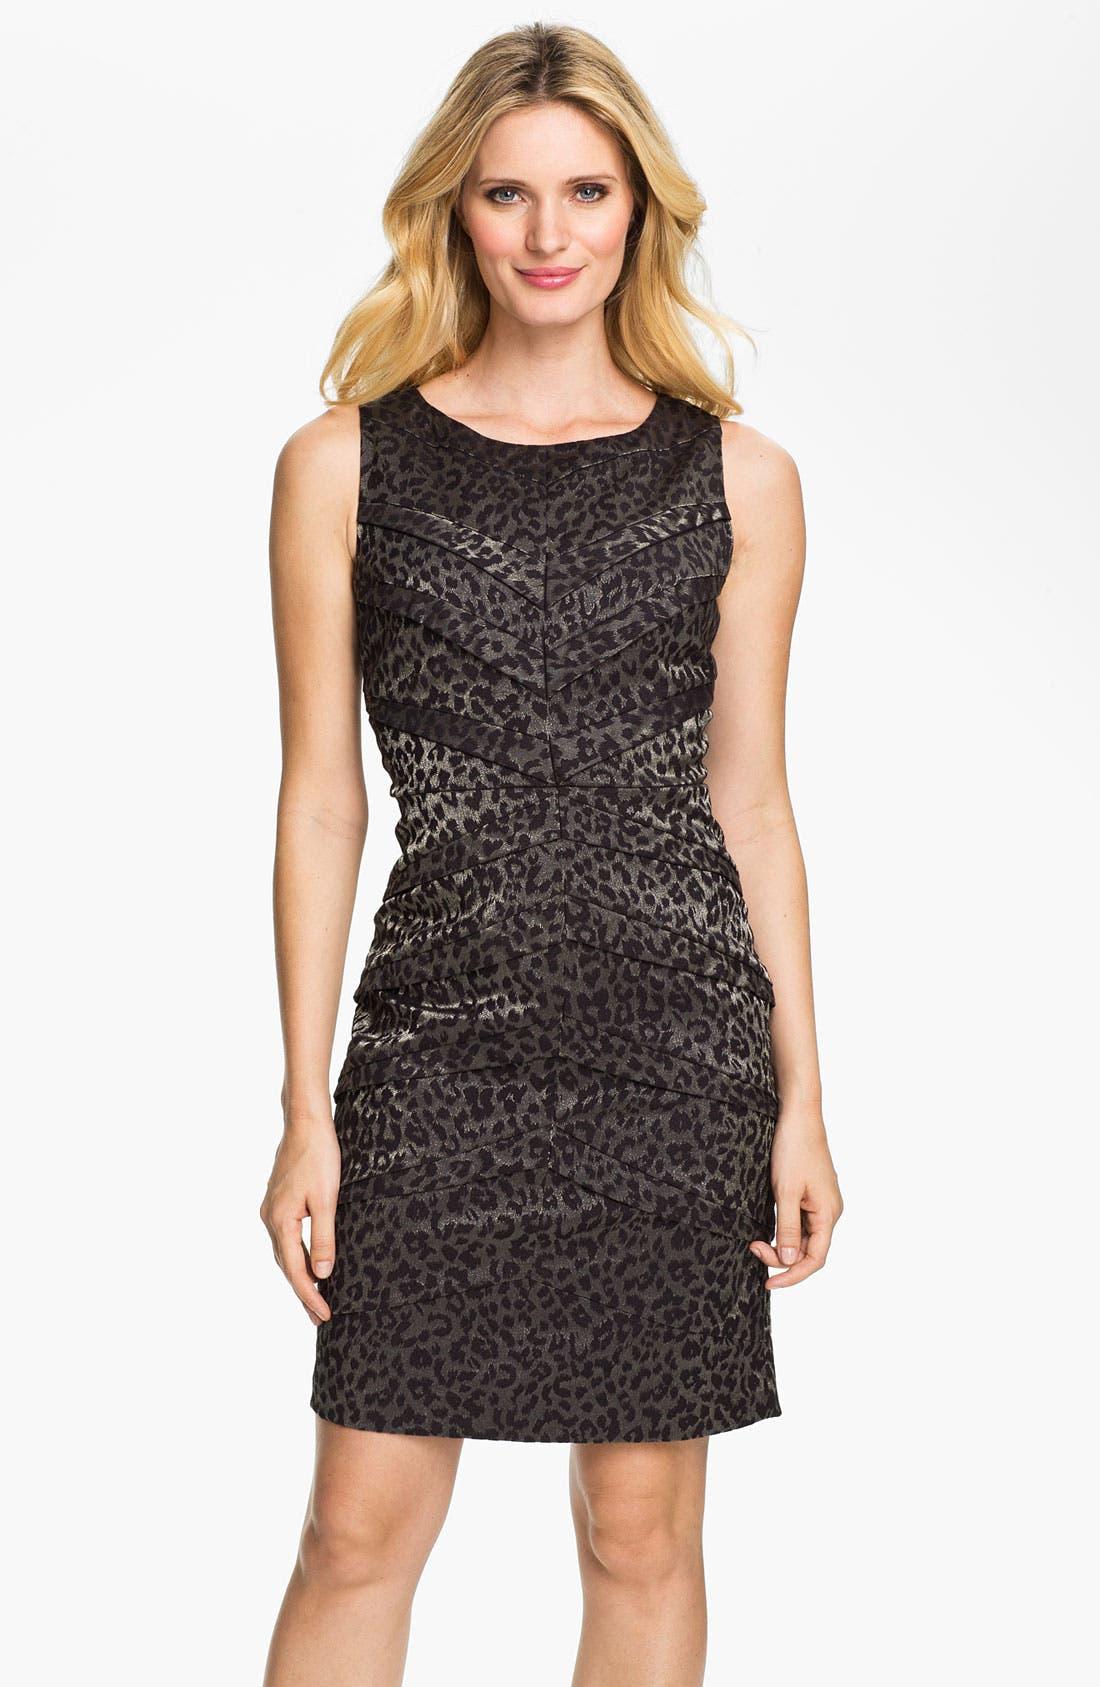 Main Image - Adrianna Papell Metallic Leopard Print Sheath Dress